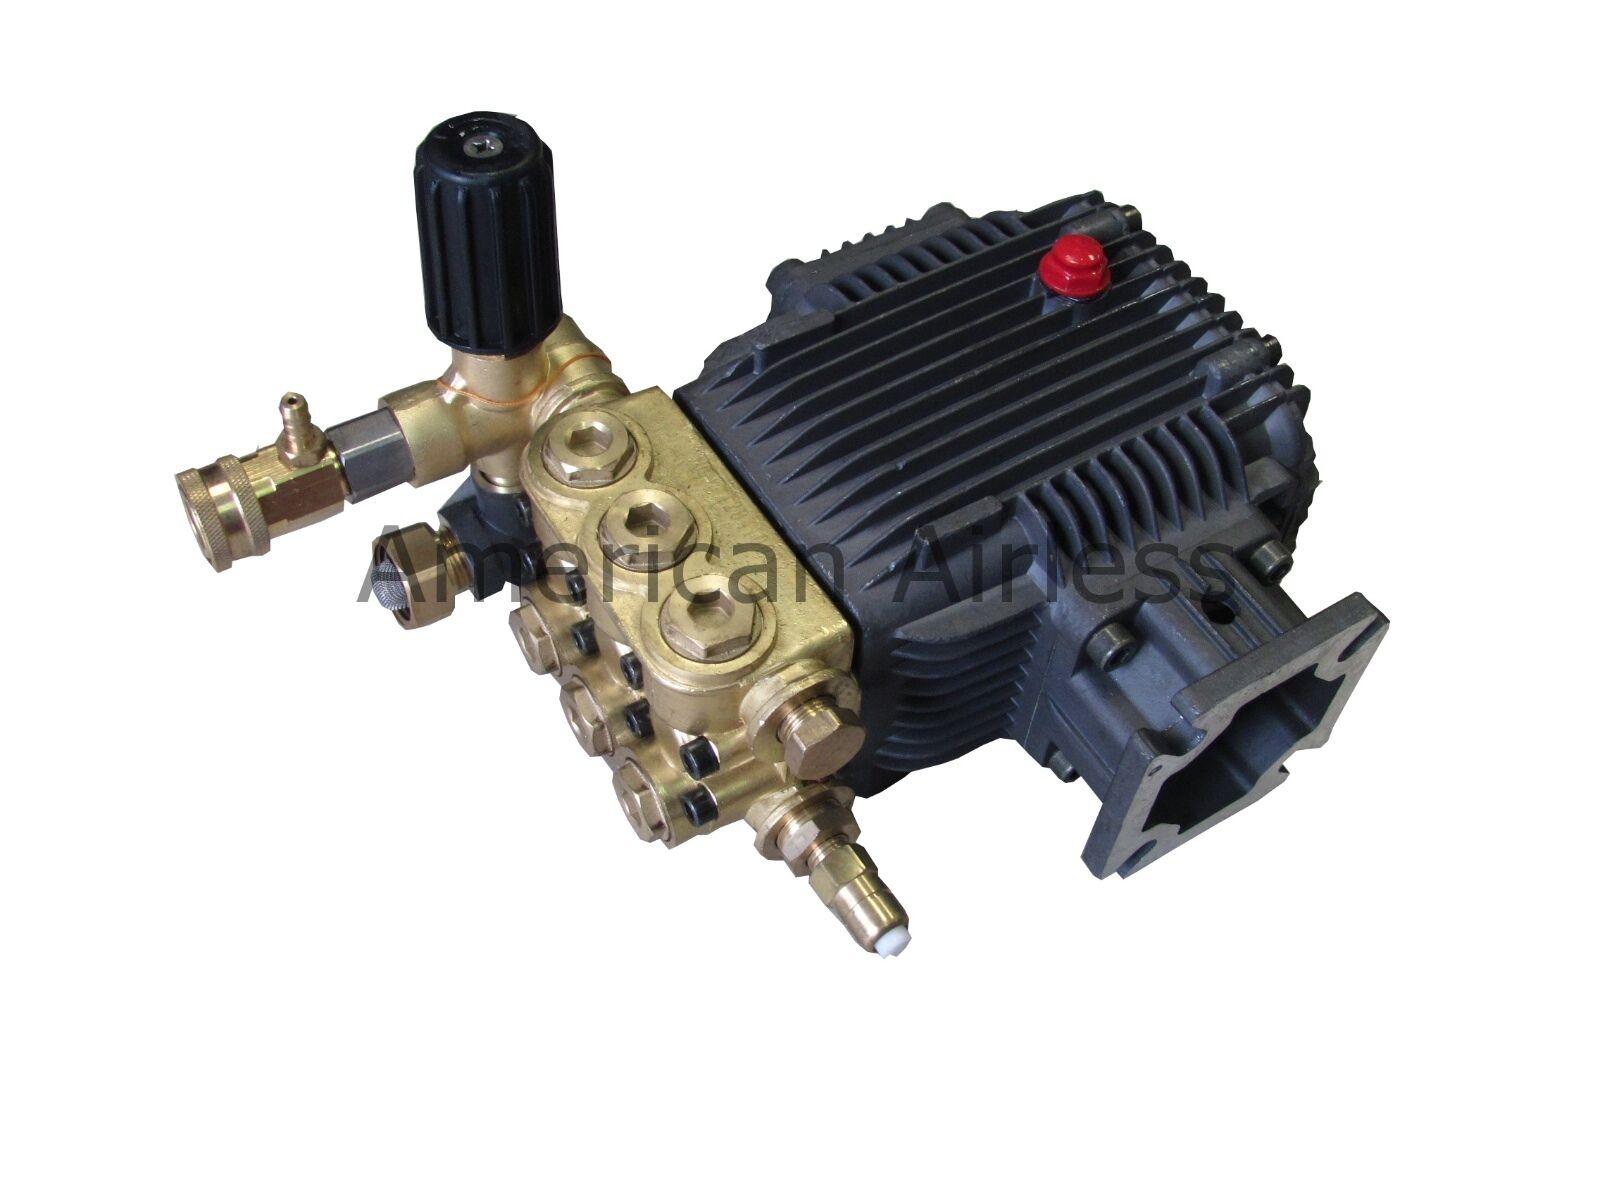 craftsman pressure washer pumps 2550 psi max 2 m parts craftsman tractor engine and wiring diagram troy bilt 2550 pressure washer troubleshooting Troy-Bilt Pressure Washer Pump